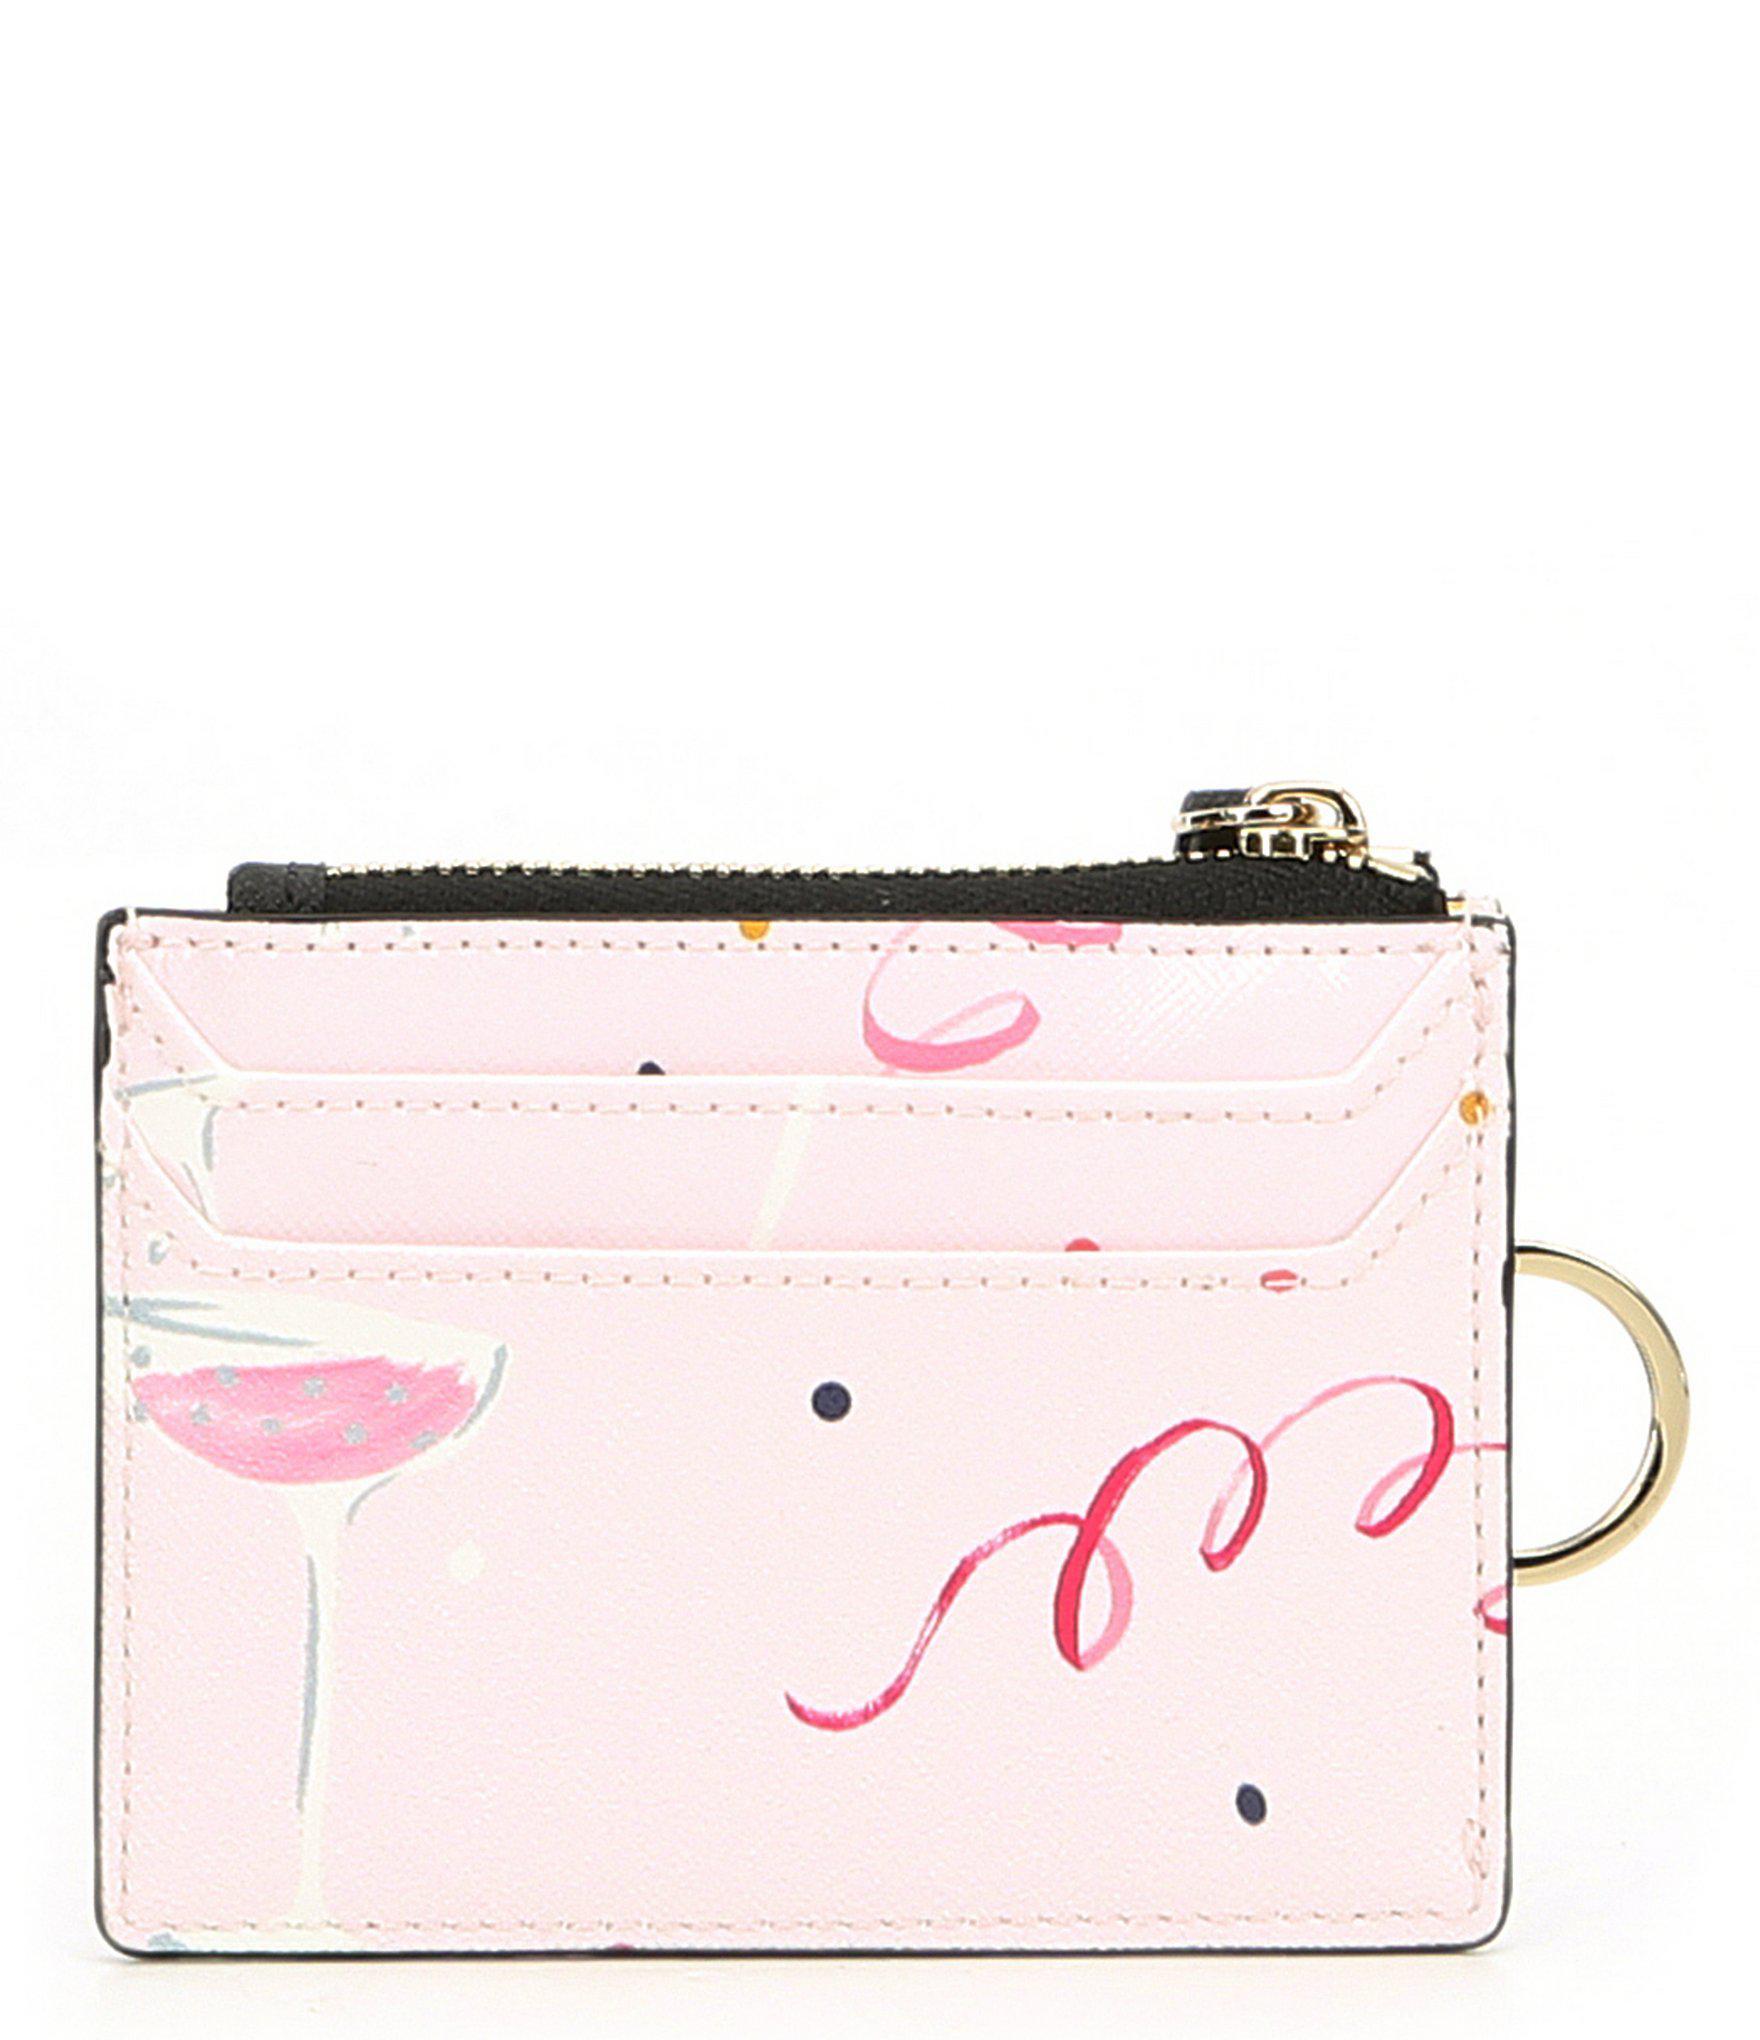 Kate Spade New York dashing beauty lalena Card Case Wallet Pink Multi color